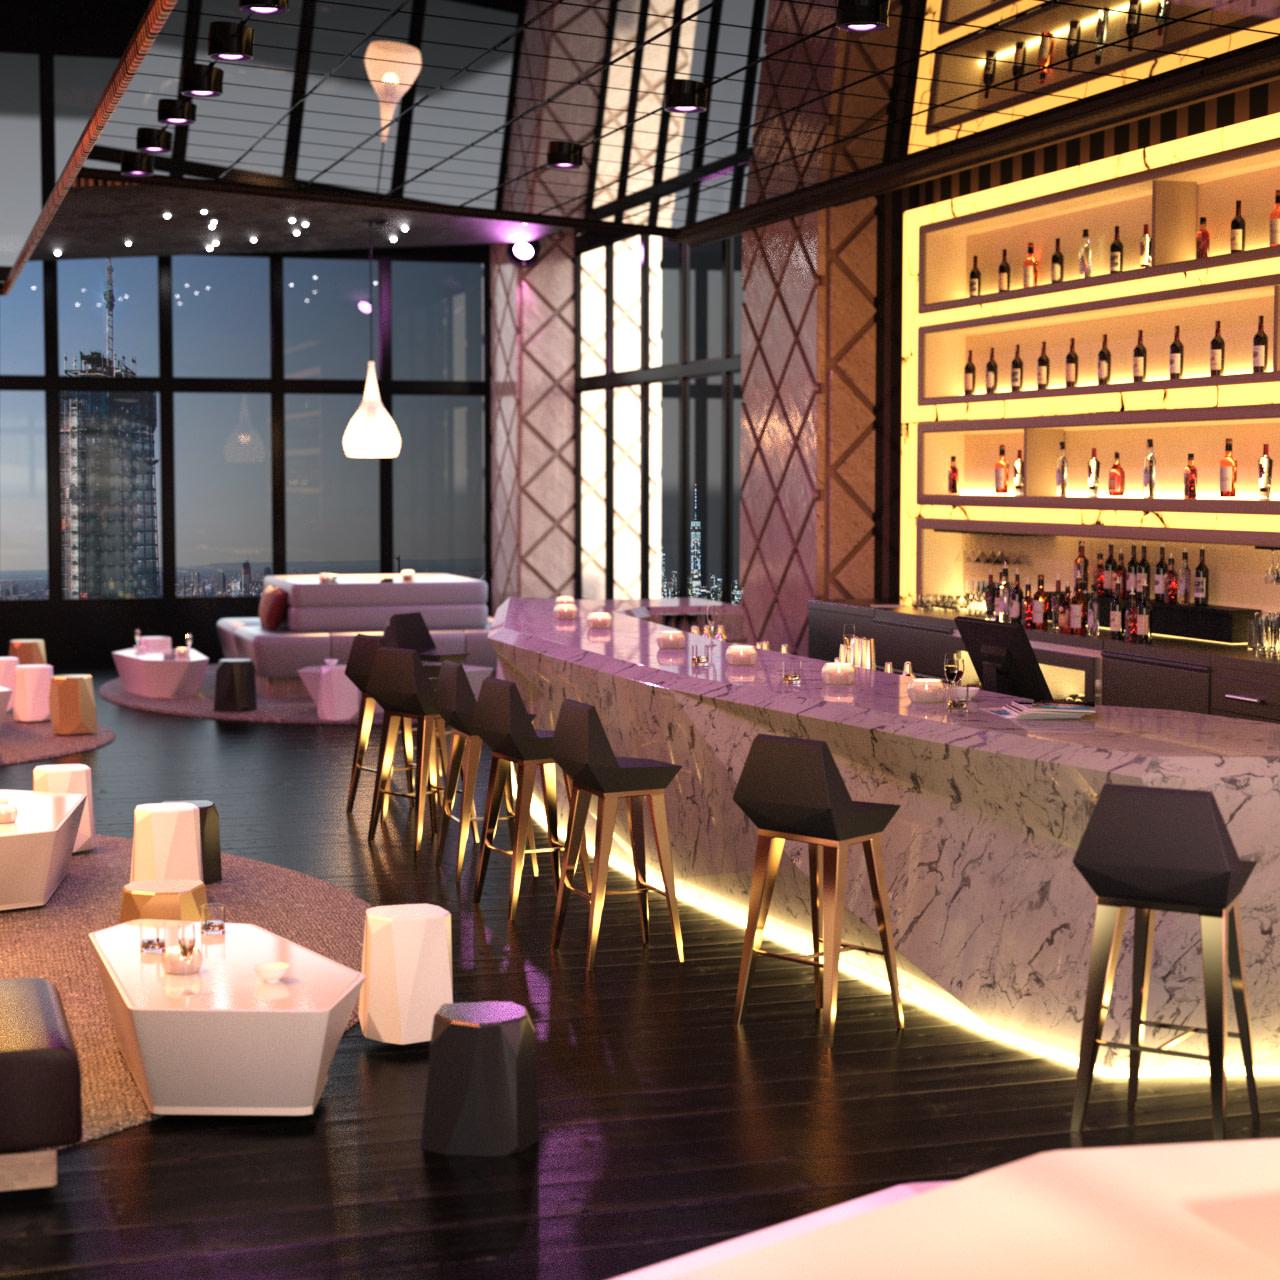 Bar interior with glass windows showing a skyscraper skyline